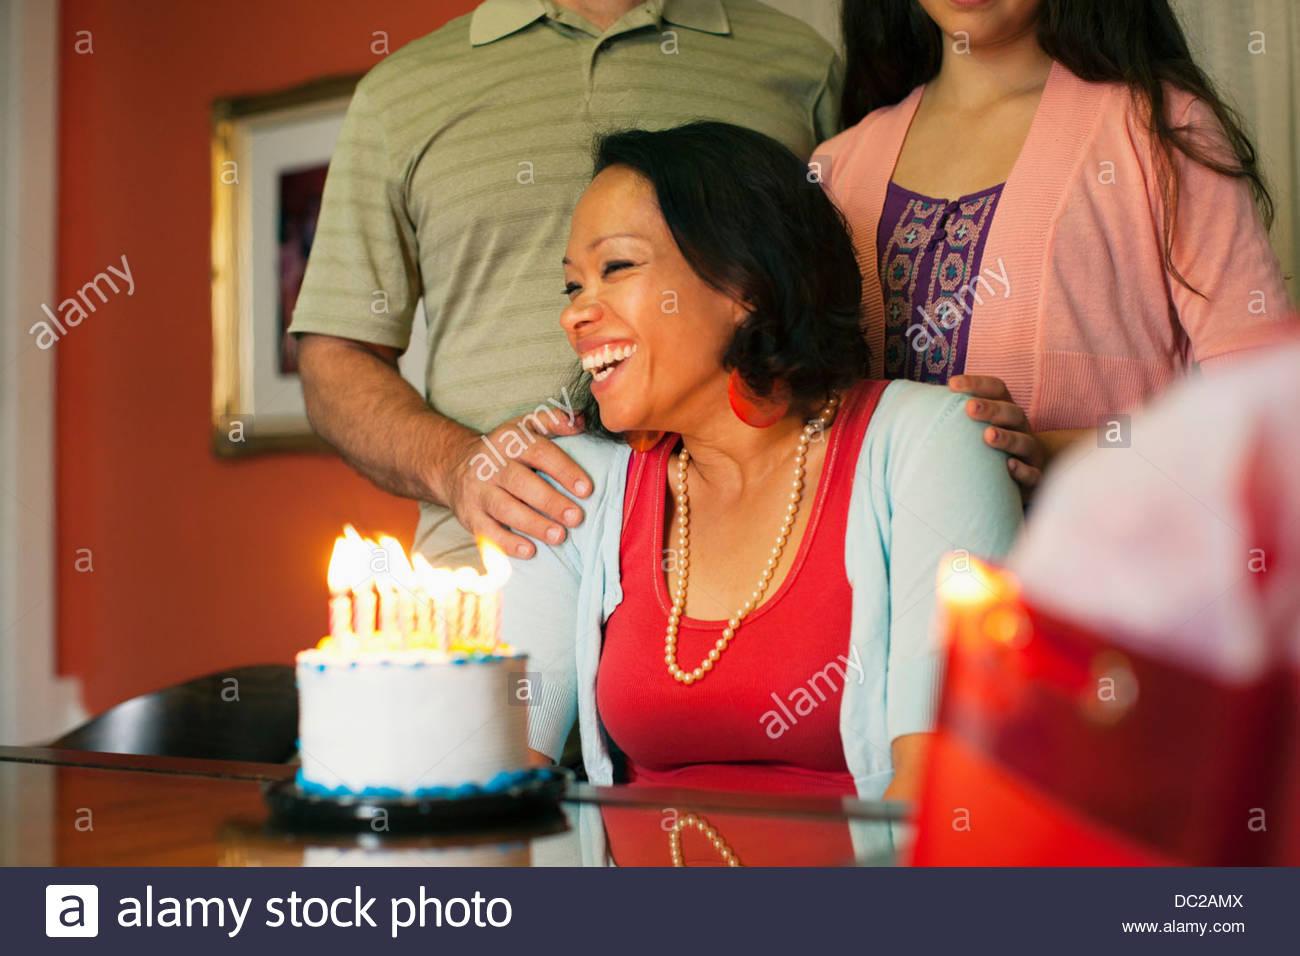 Woman smiling over birthday cake - Stock Image